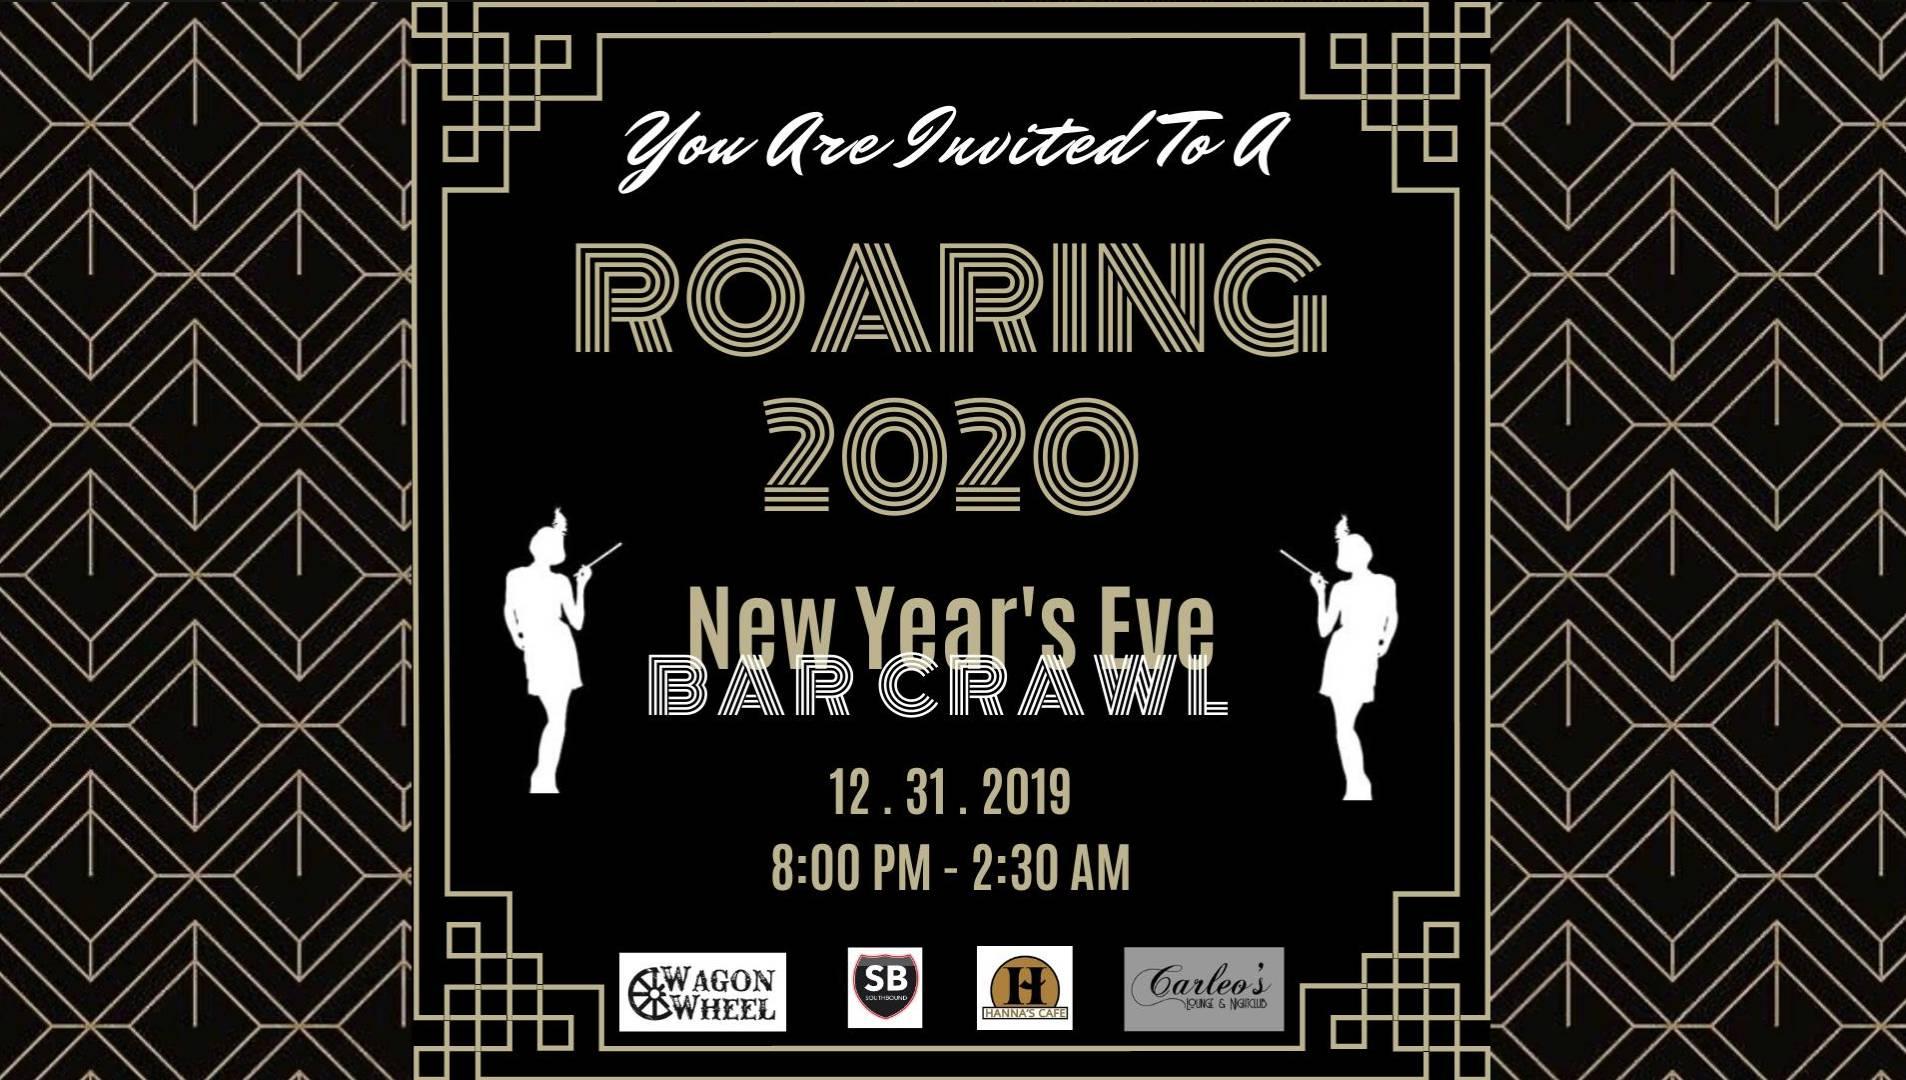 New Years Eve 2020 Bar Crawl